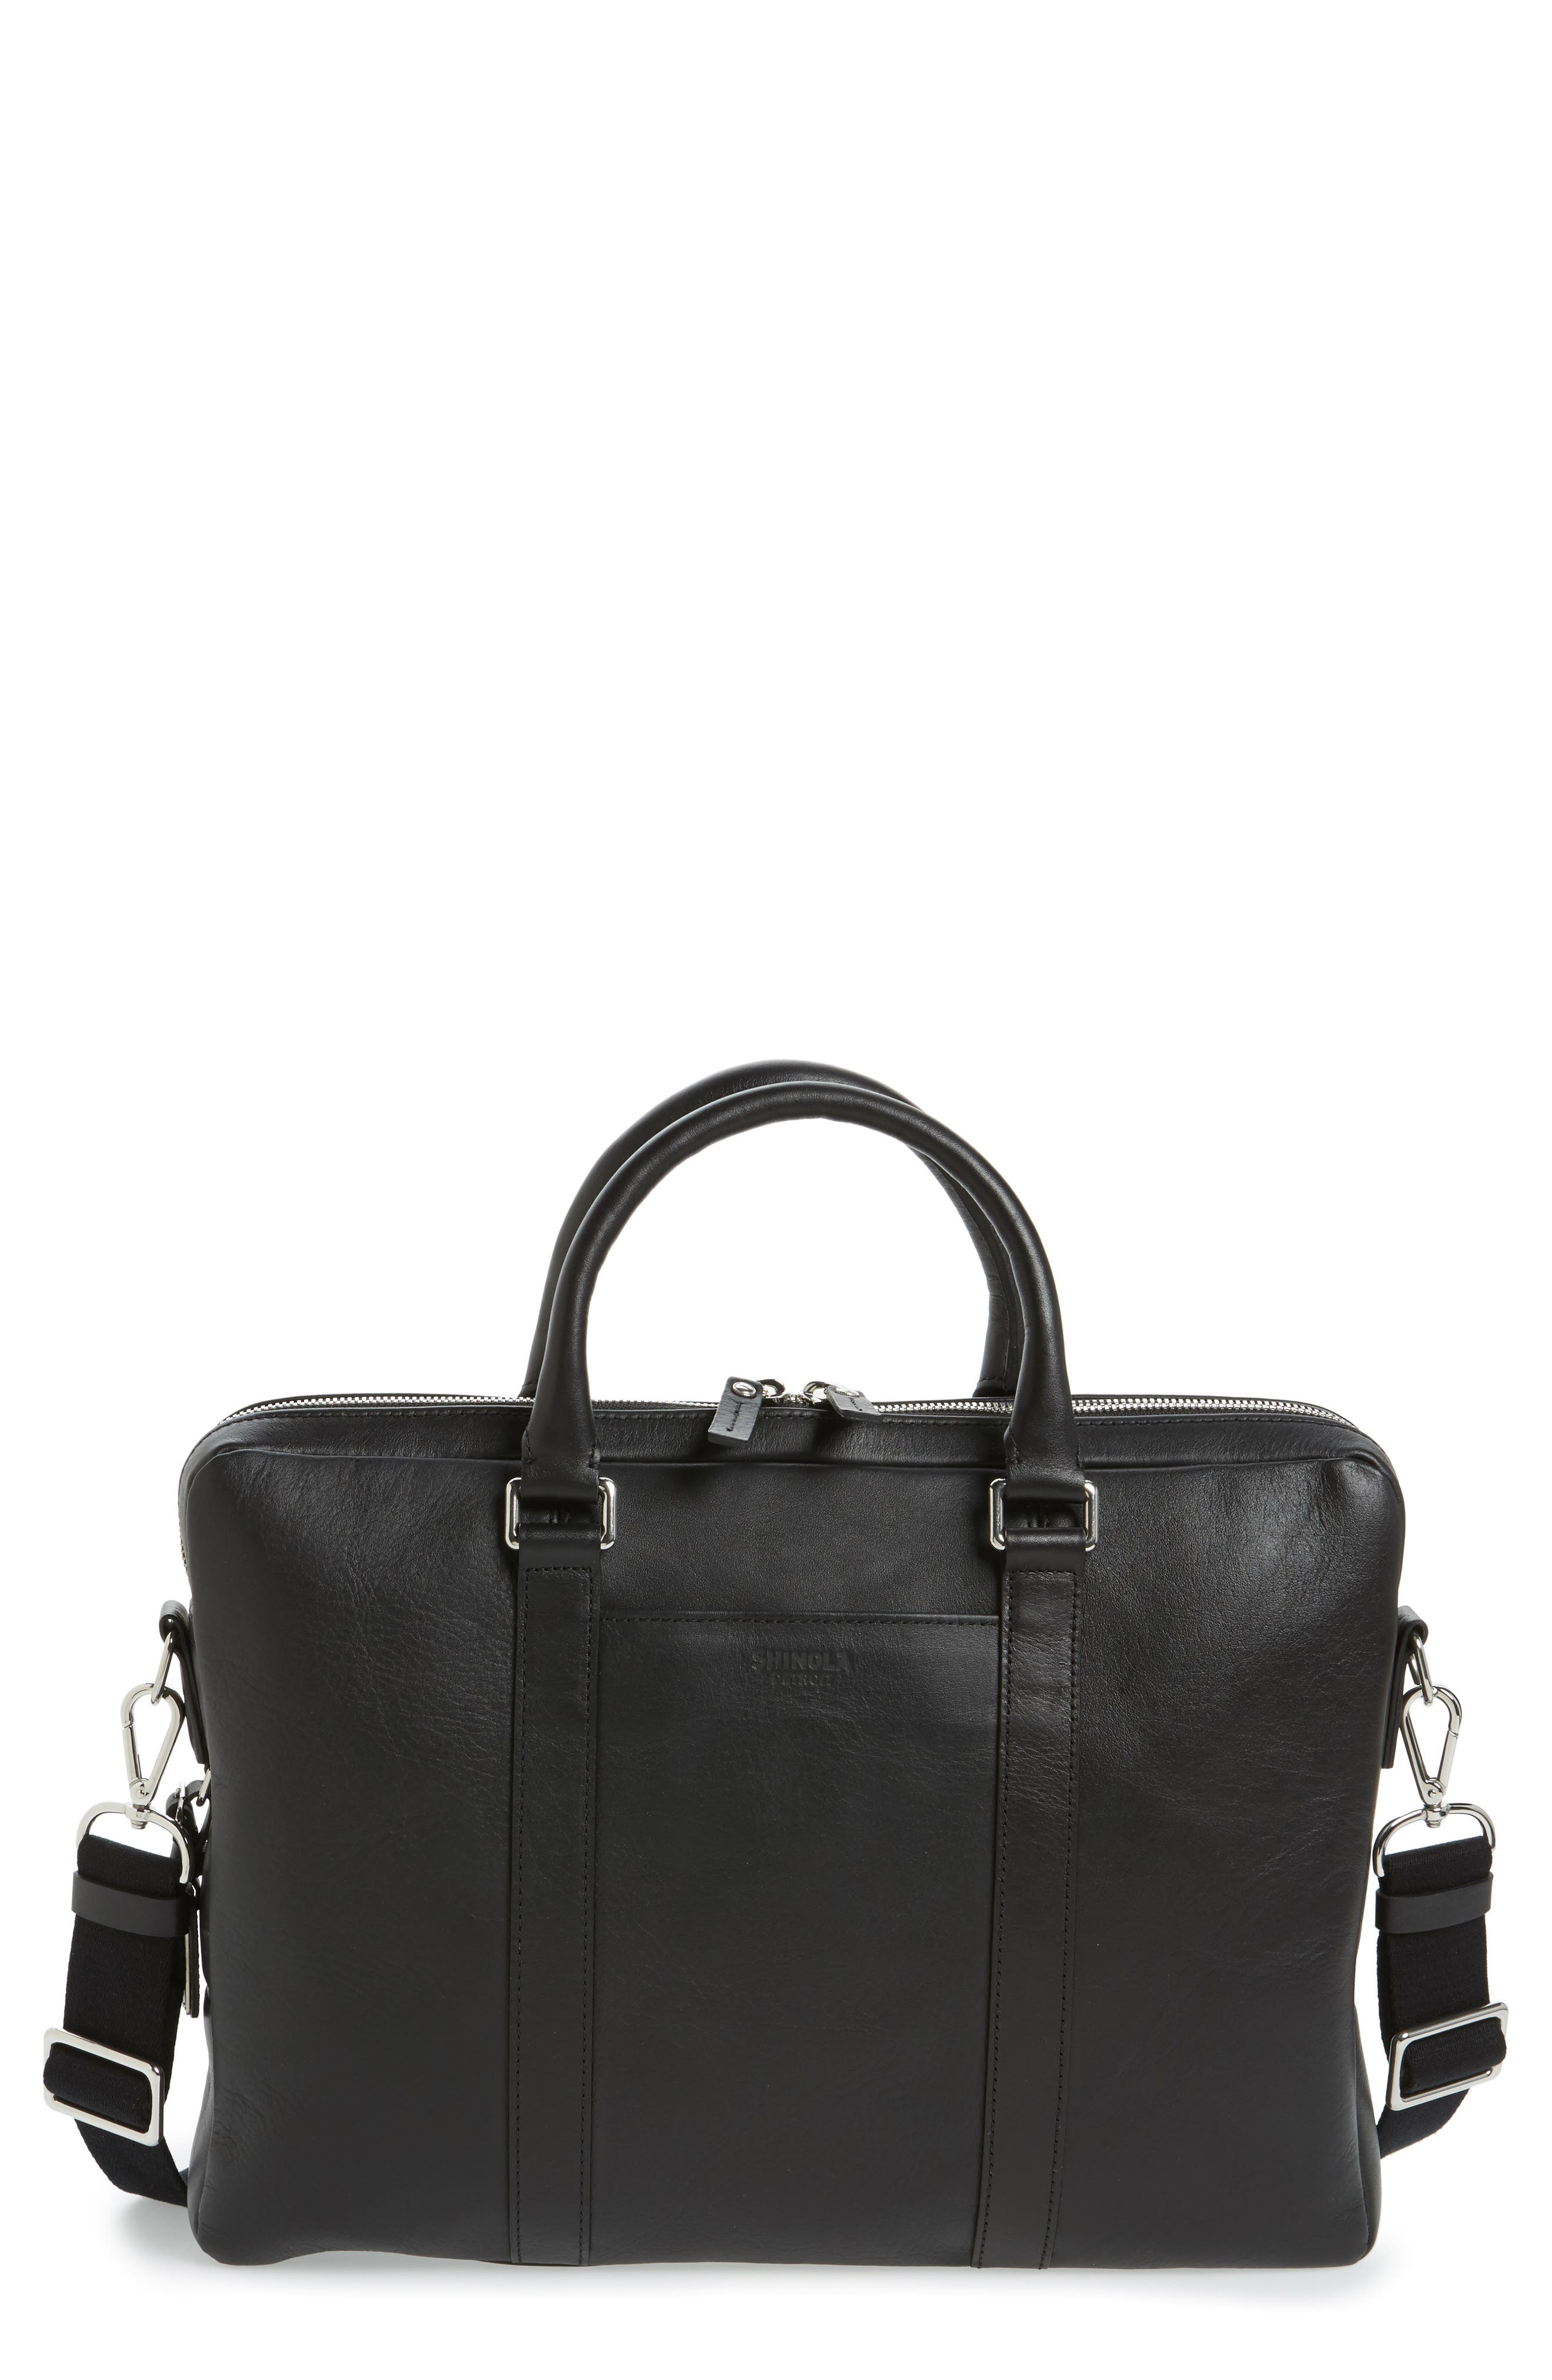 Main Image - Shinola Signature Leather Briefcase